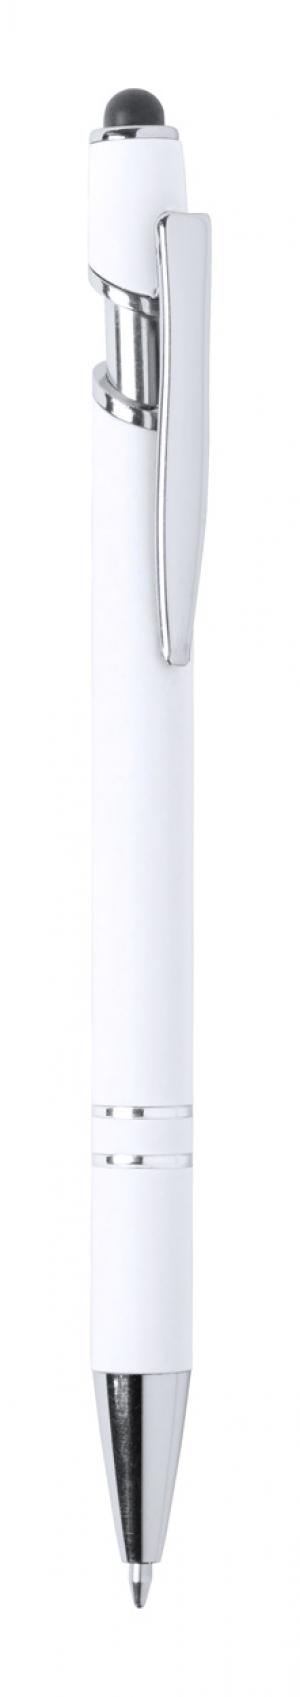 Verslo dovanos Lekor (touch ballpoint pen)